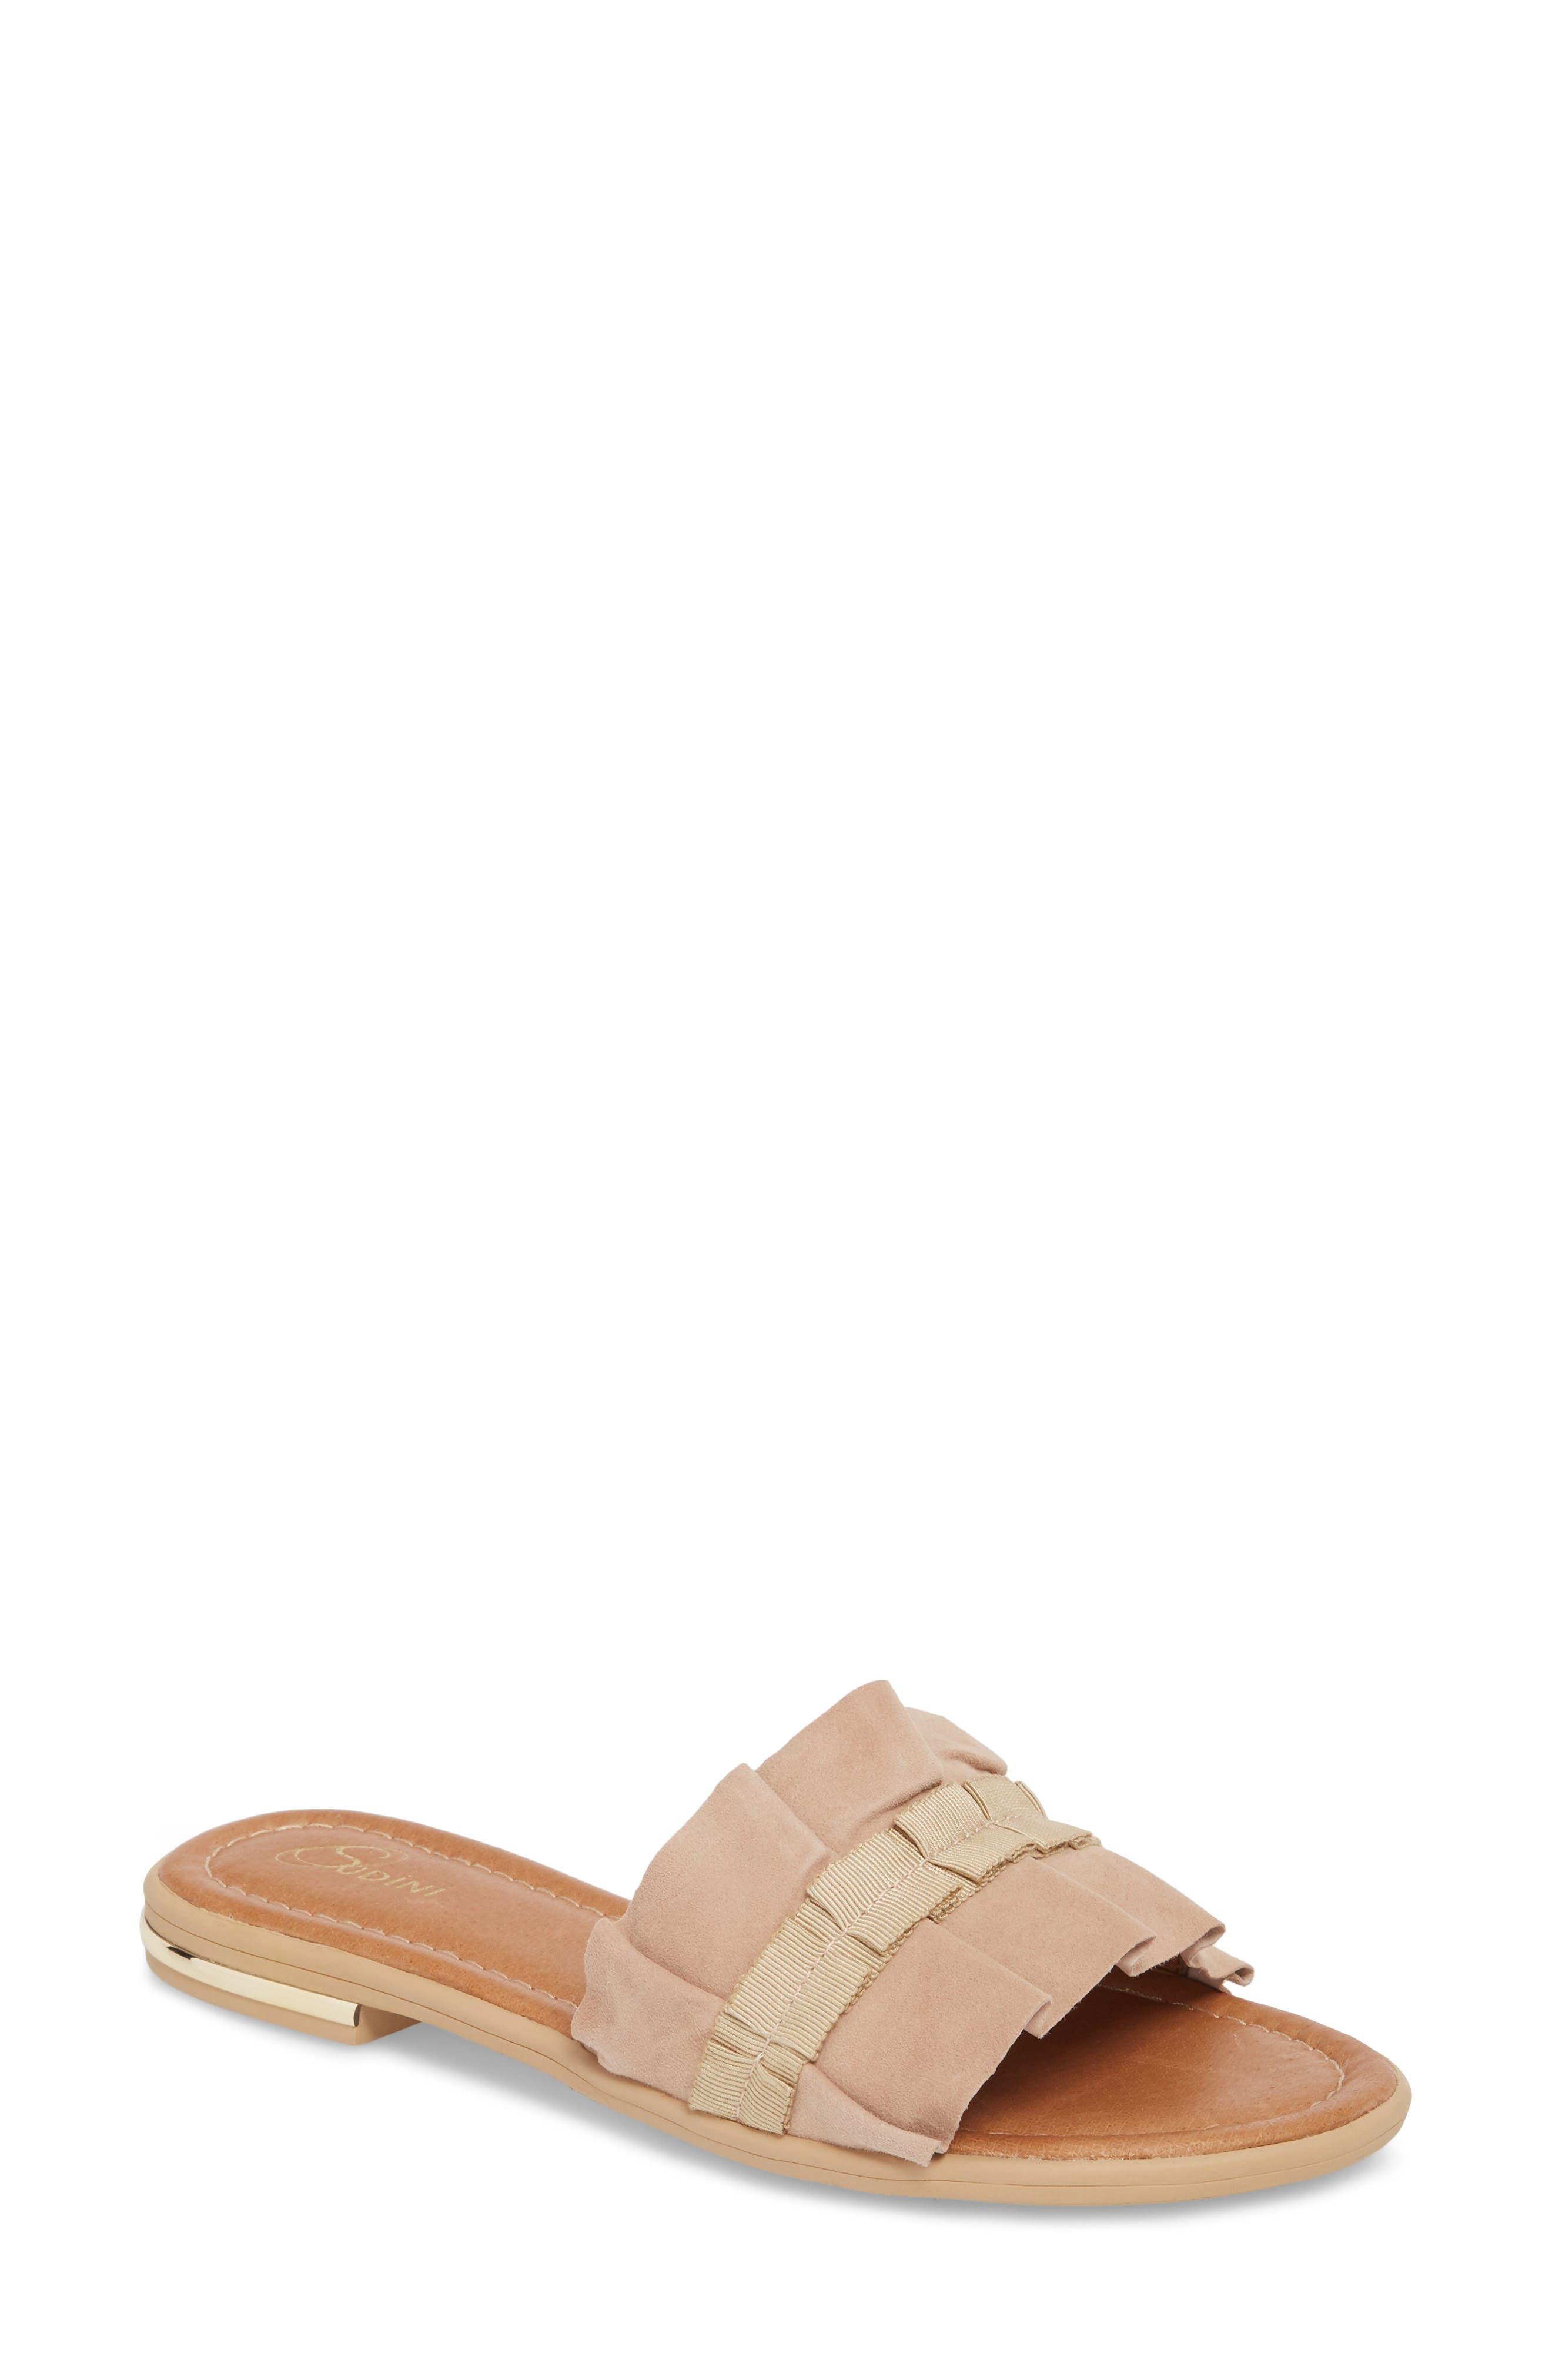 Sudini Ravenna Slide Sandal, Beige